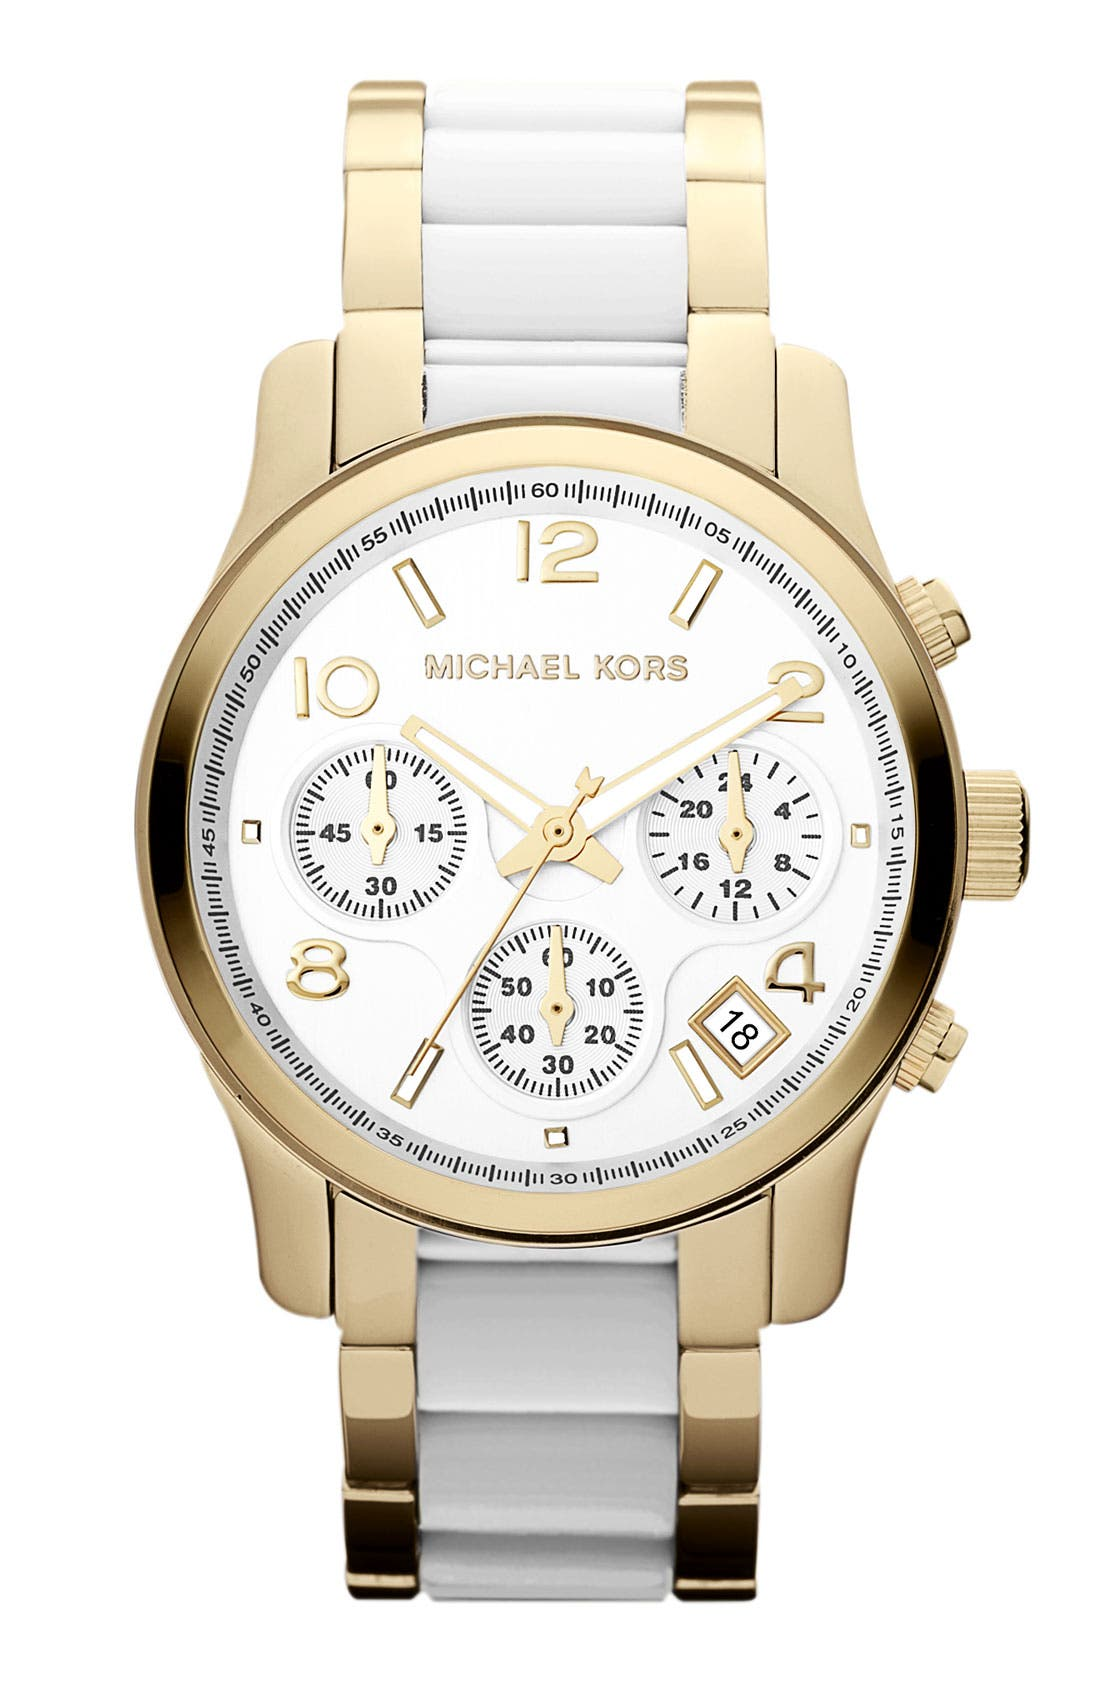 Main Image - Michael Kors 'Runway' Chronograph Bracelet Watch, 38mm